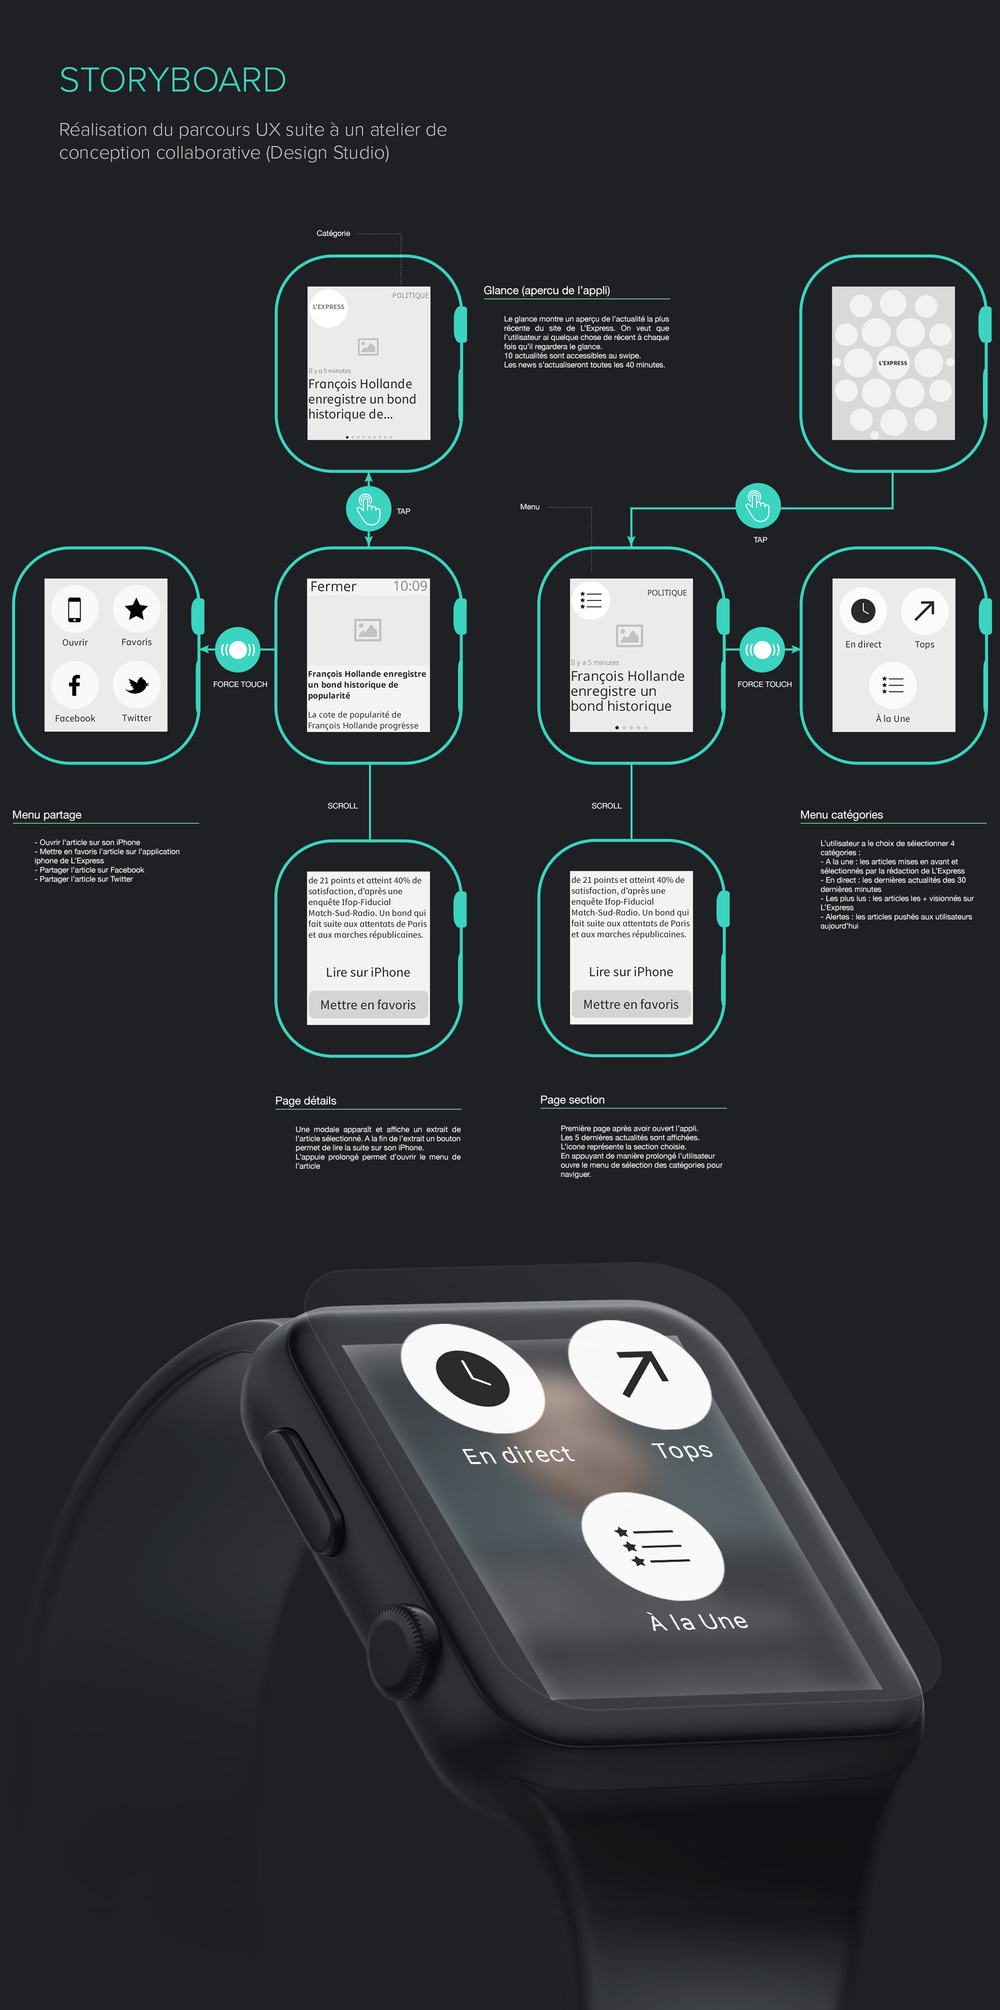 L'Express Apple Watch : storyboard et parcours UX